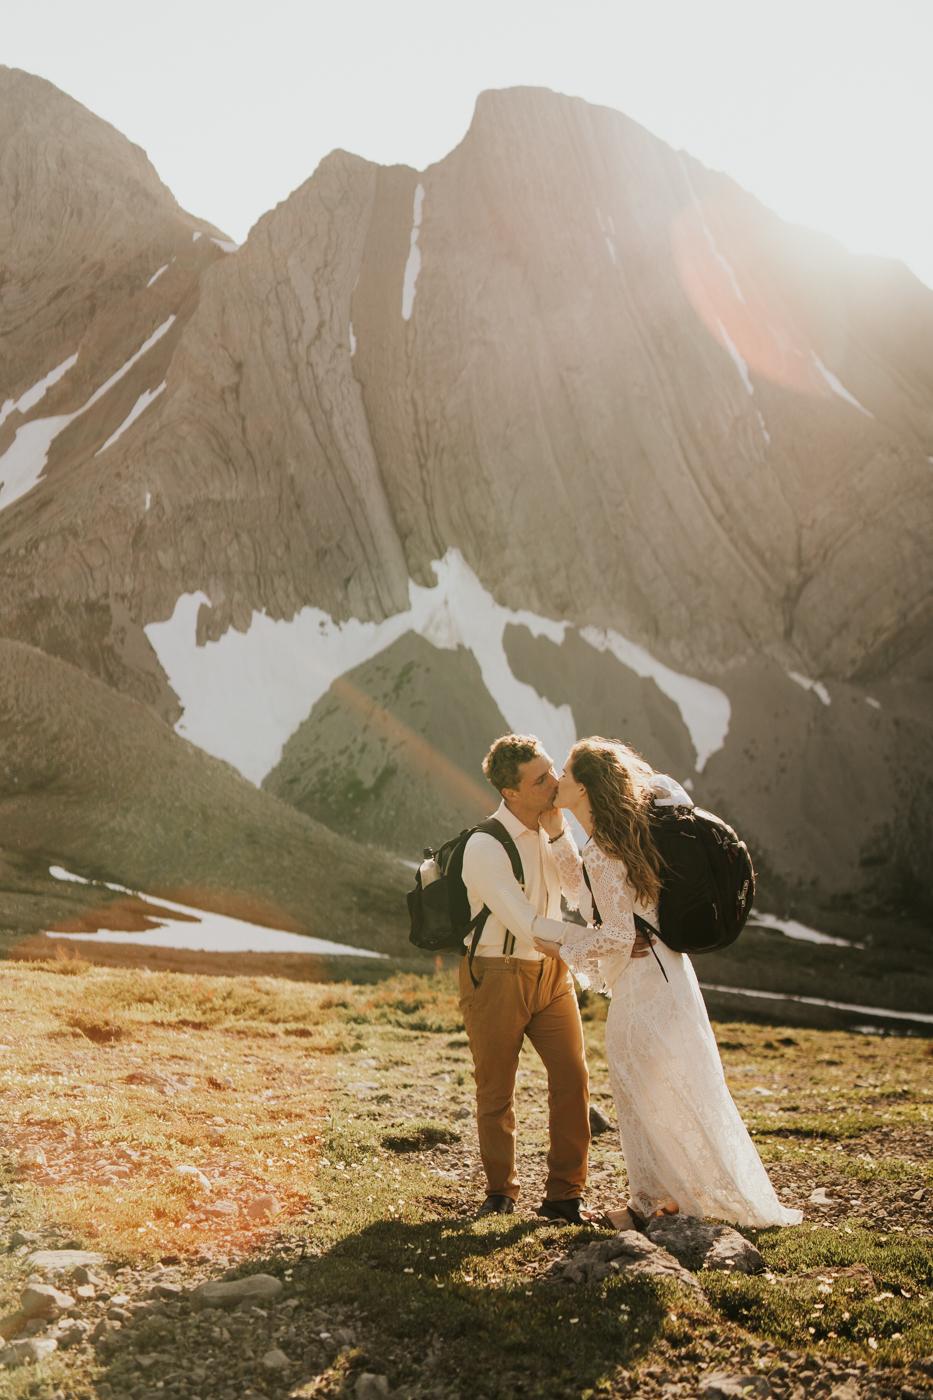 tyraephotography_photographer_wedding_elopement_engagement_photography-08478.jpg